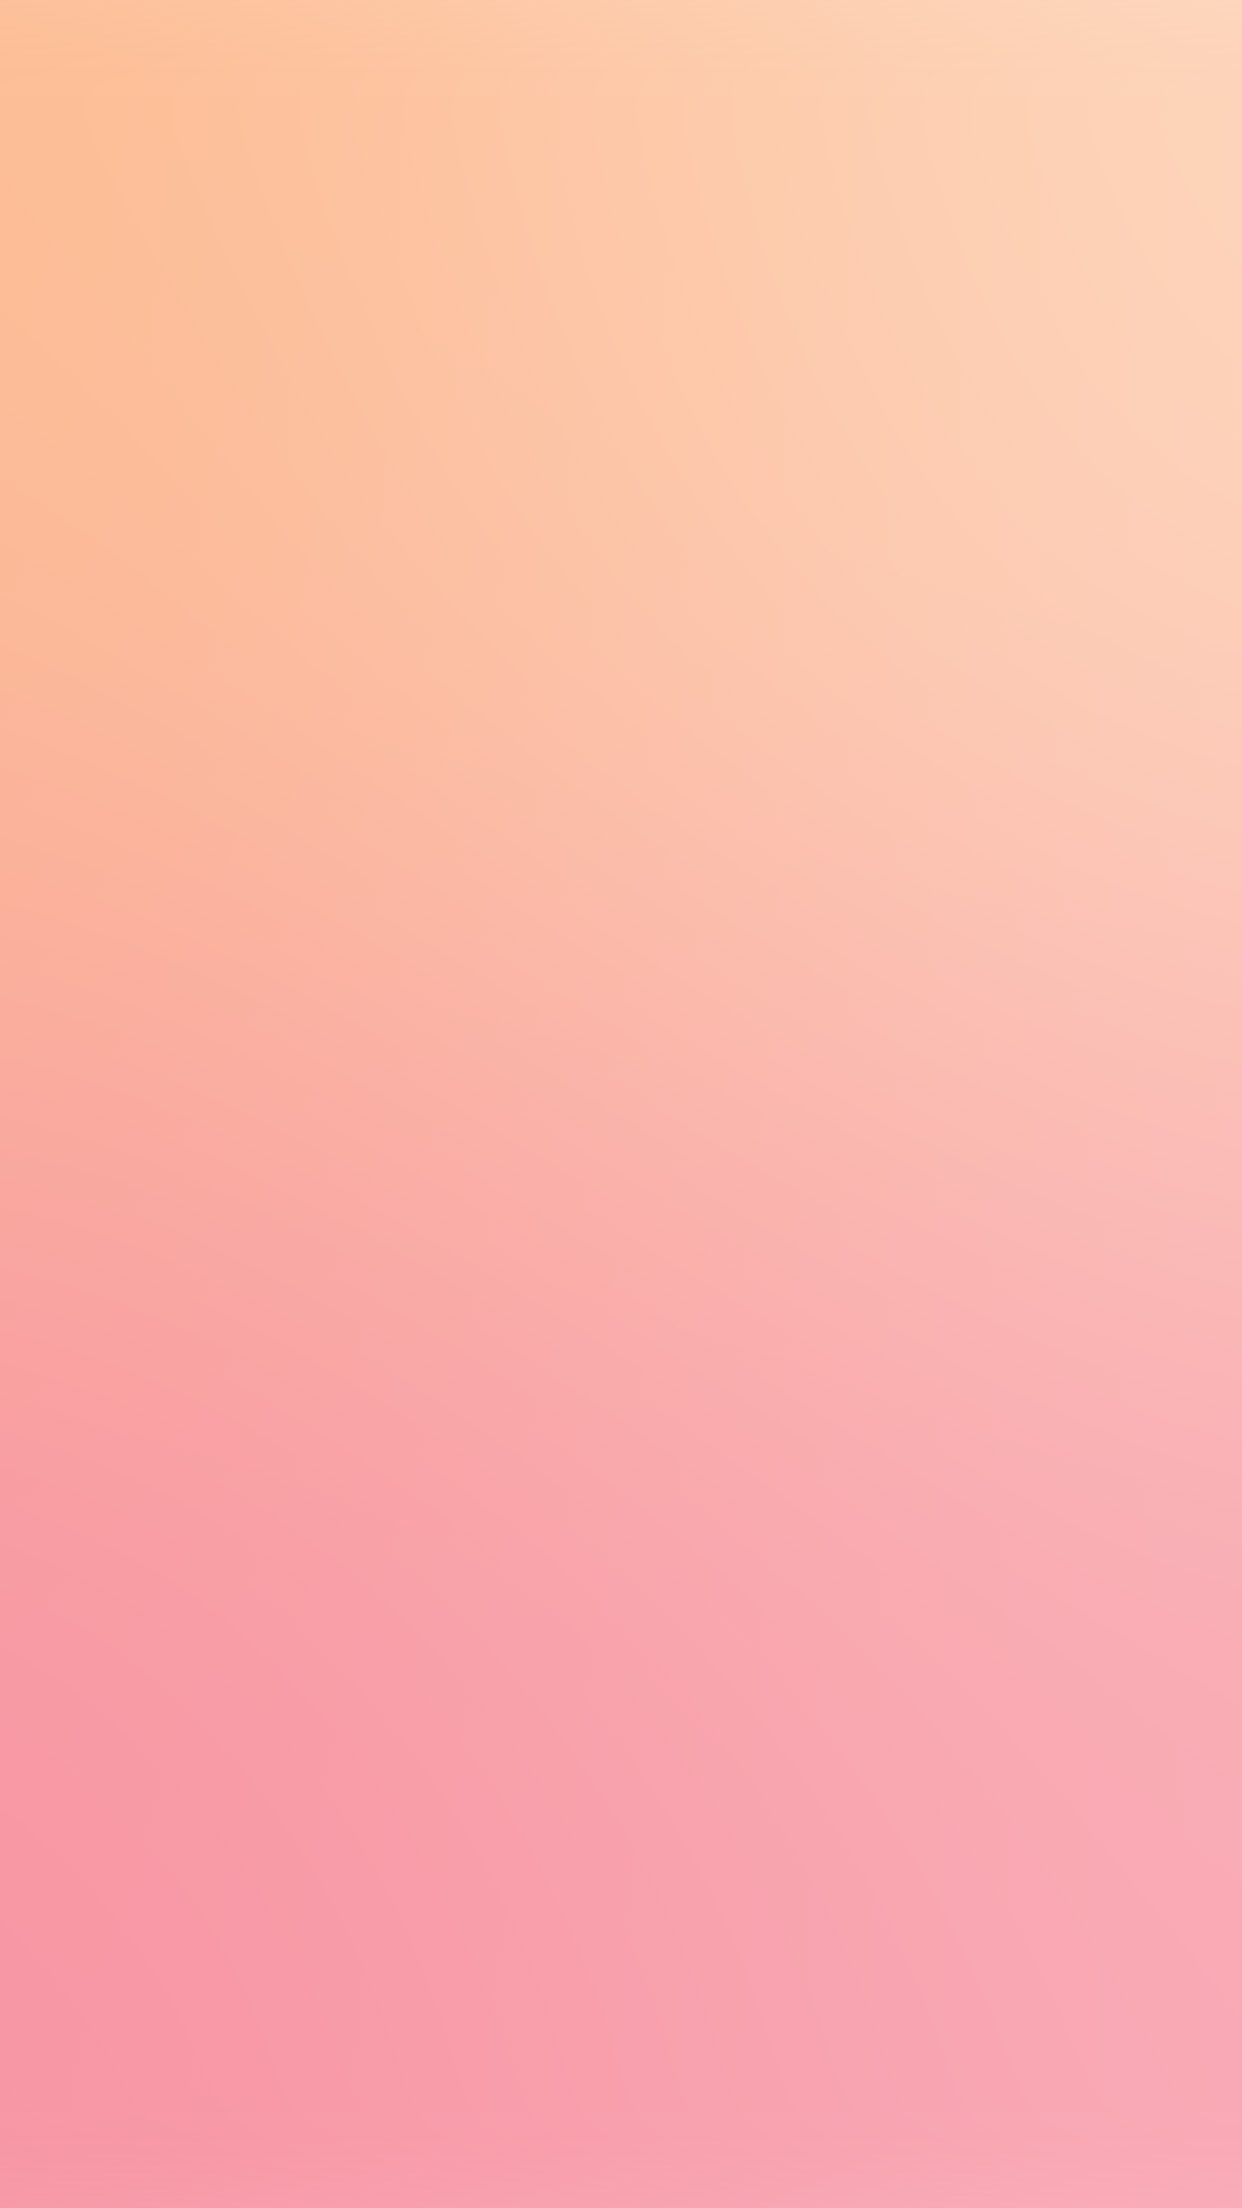 Pastel Red Background Tumblr